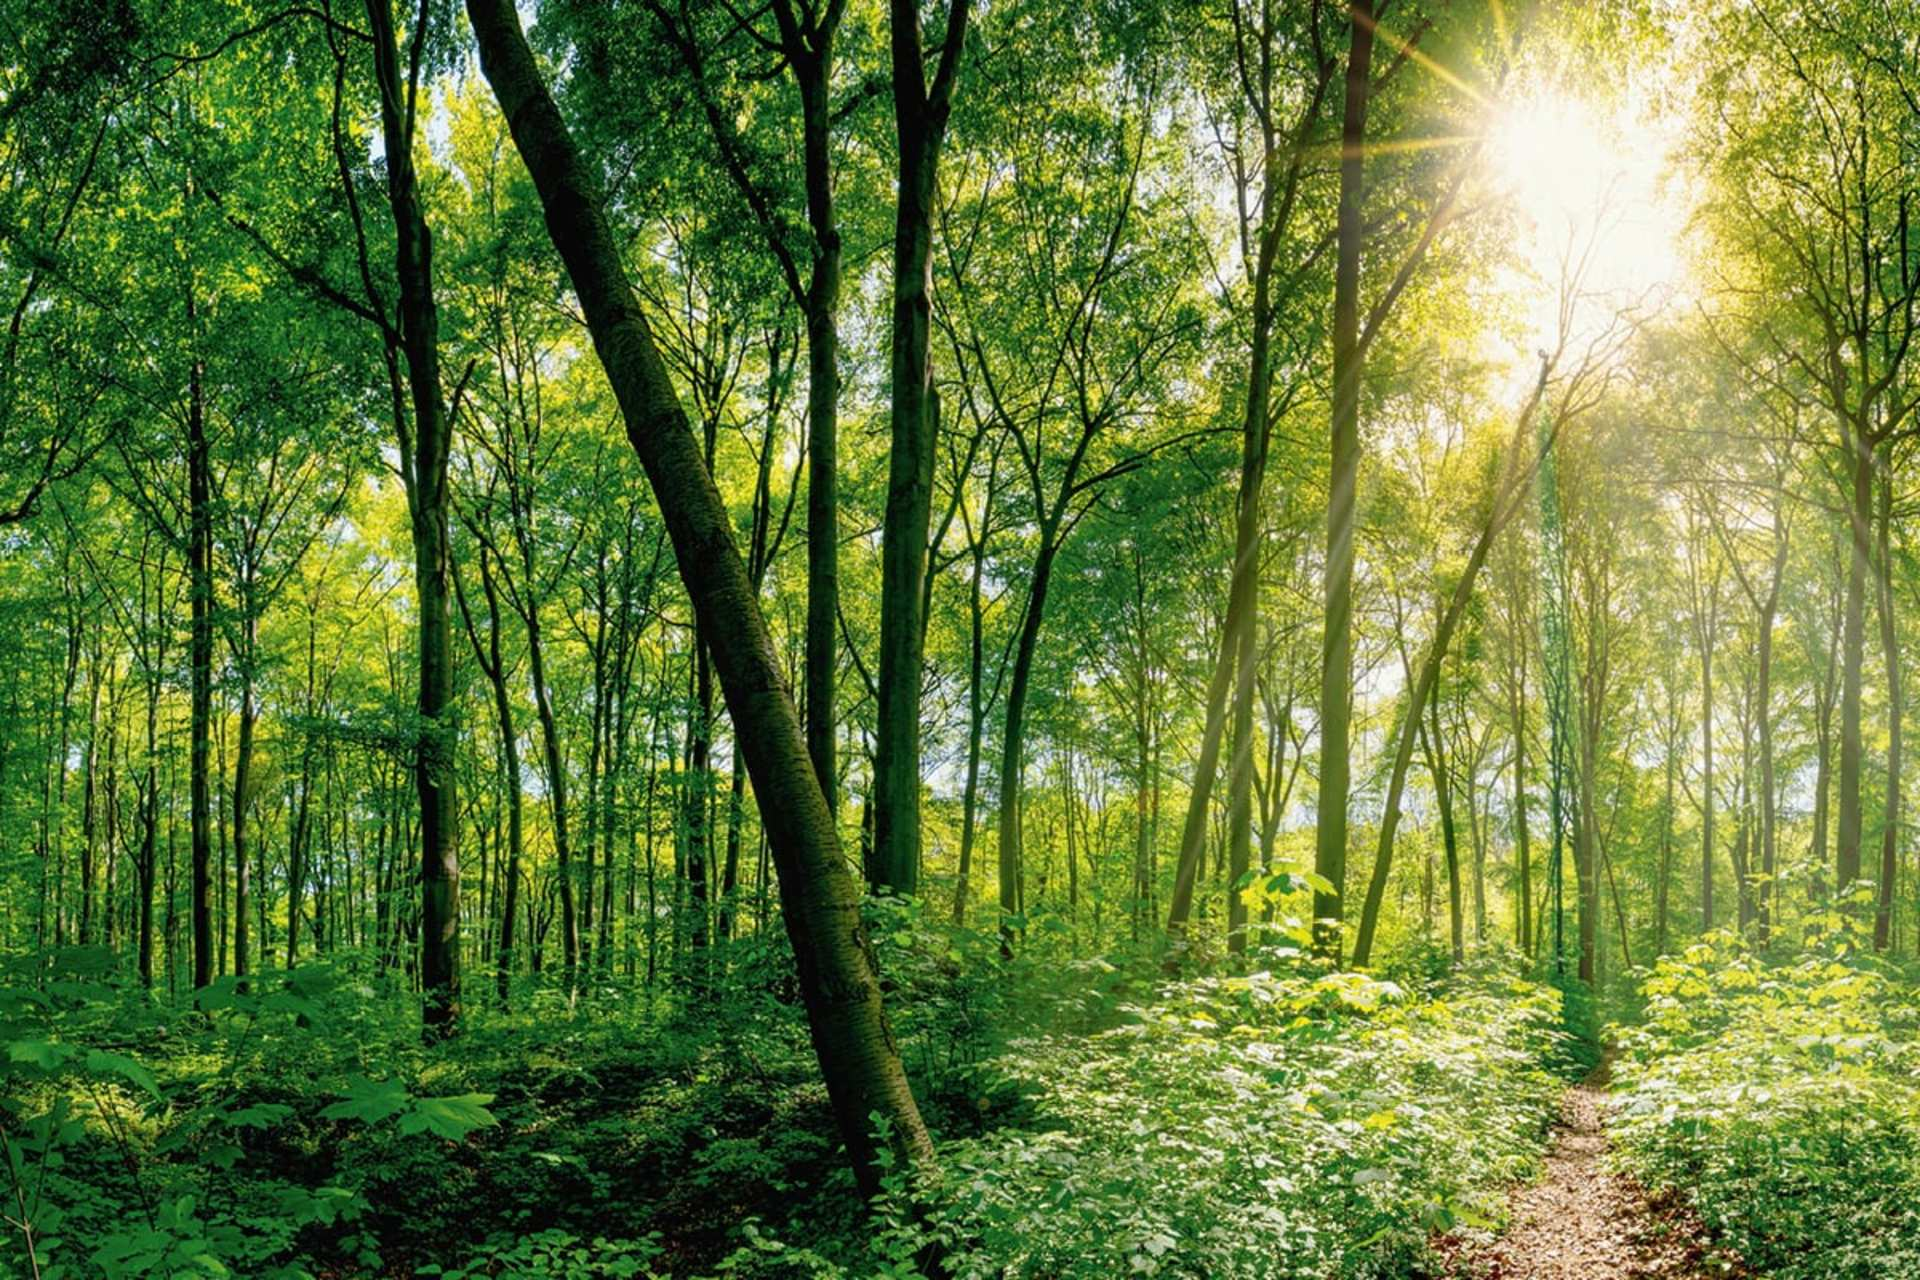 Website_Nachhaltigkeit_Nachhaltigkeitskonzept_1200x800px